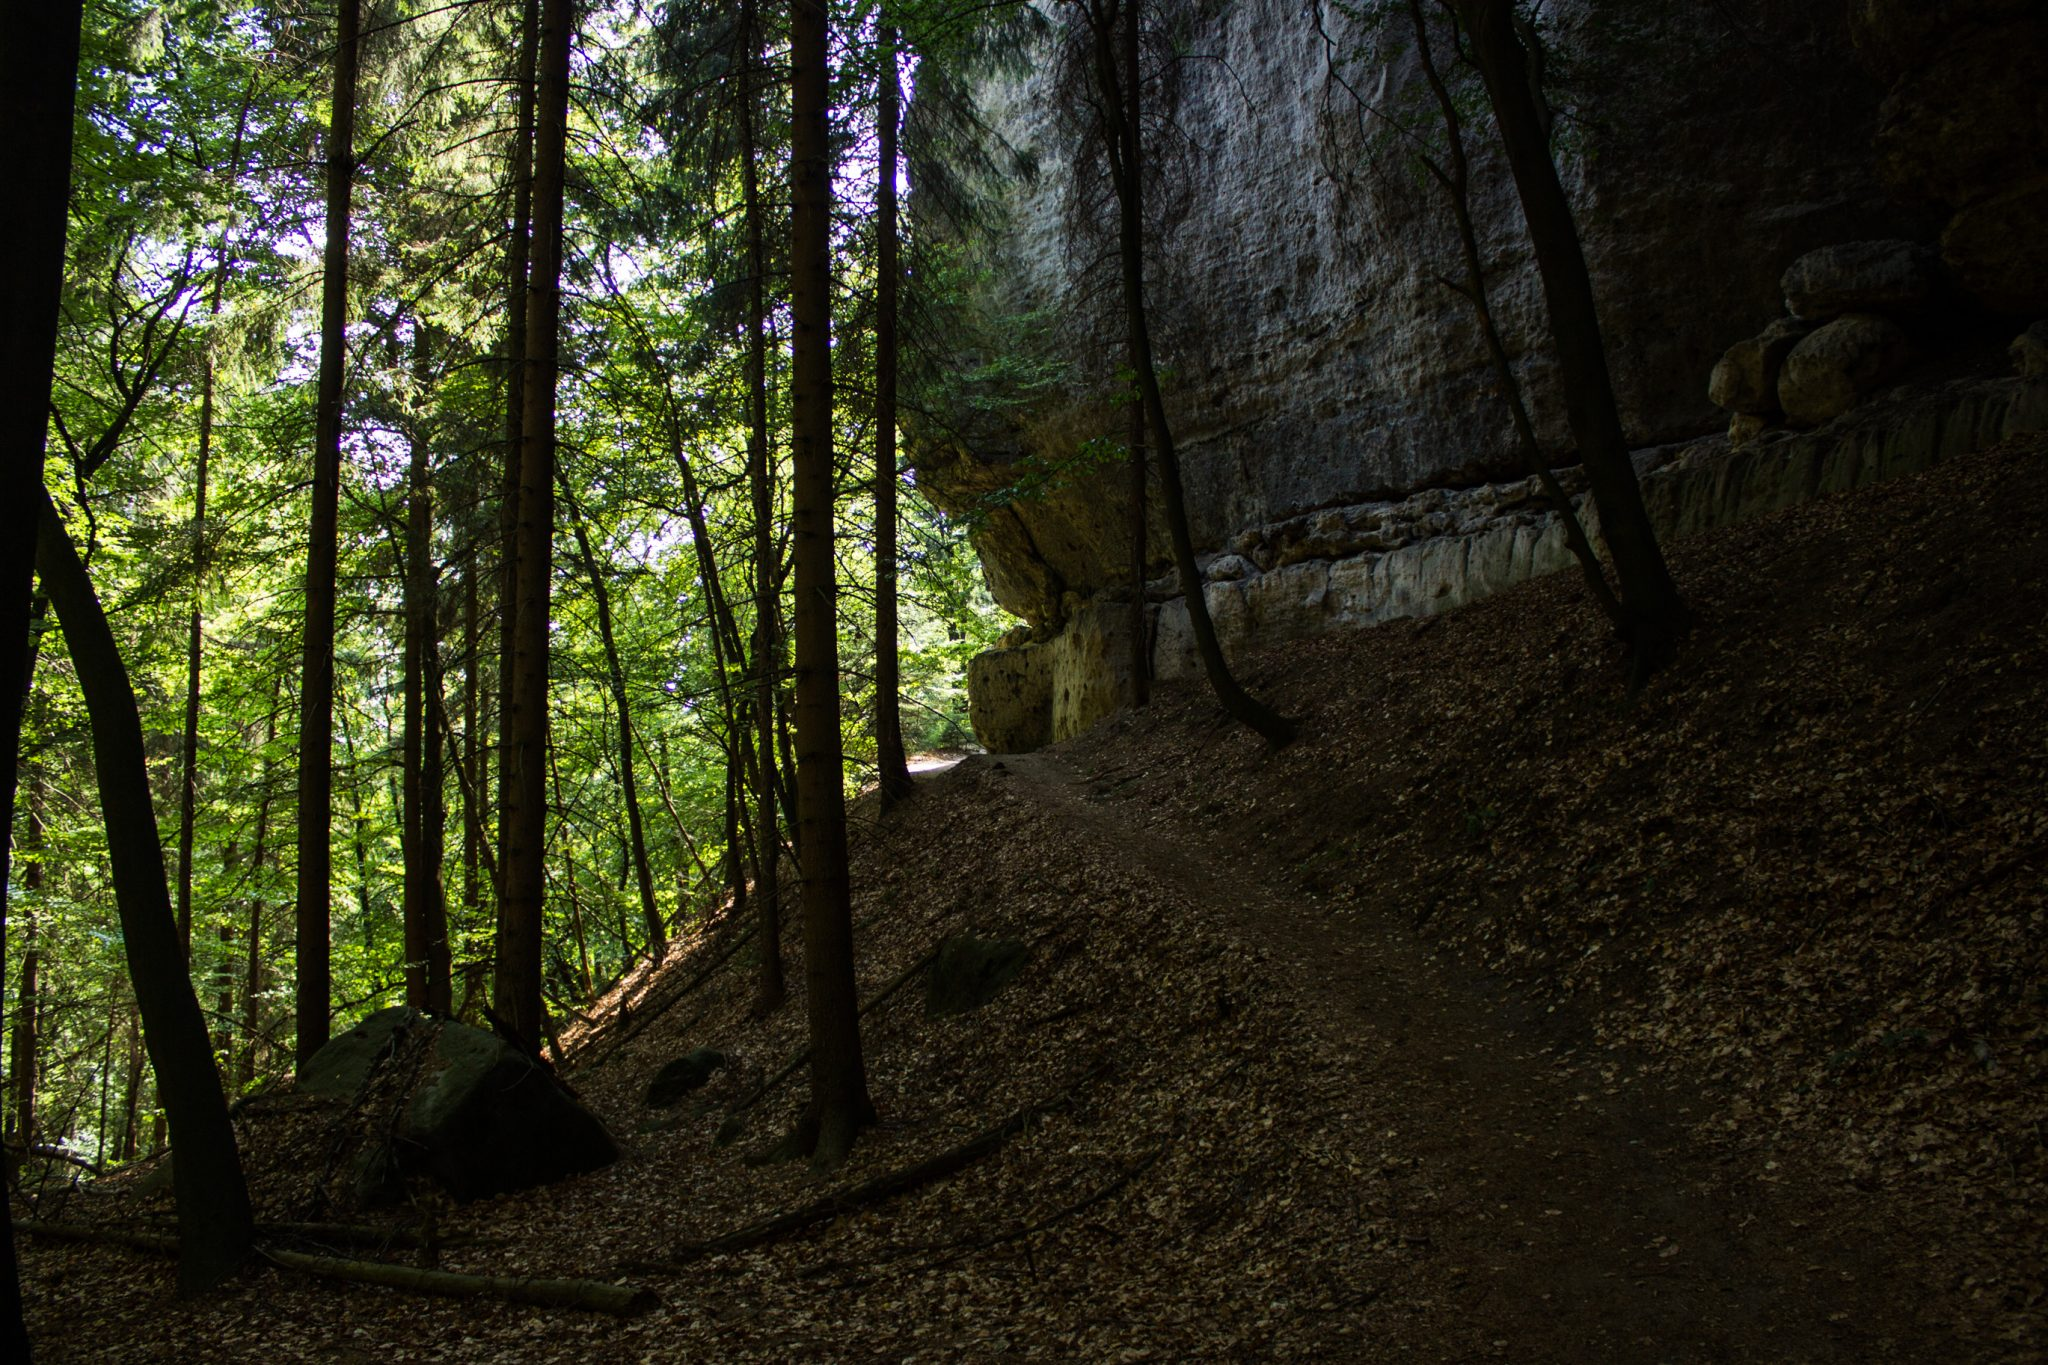 Zeughaus Roß- und Goldsteig Richterschlüchte im Kirnitzschtal wandern, Wanderweg im Wanderparadies Sächsische Schweiz mit vielen tollen Aussichten, riesiger Felsennationalpark, Weg direkt an den Felsen entlang